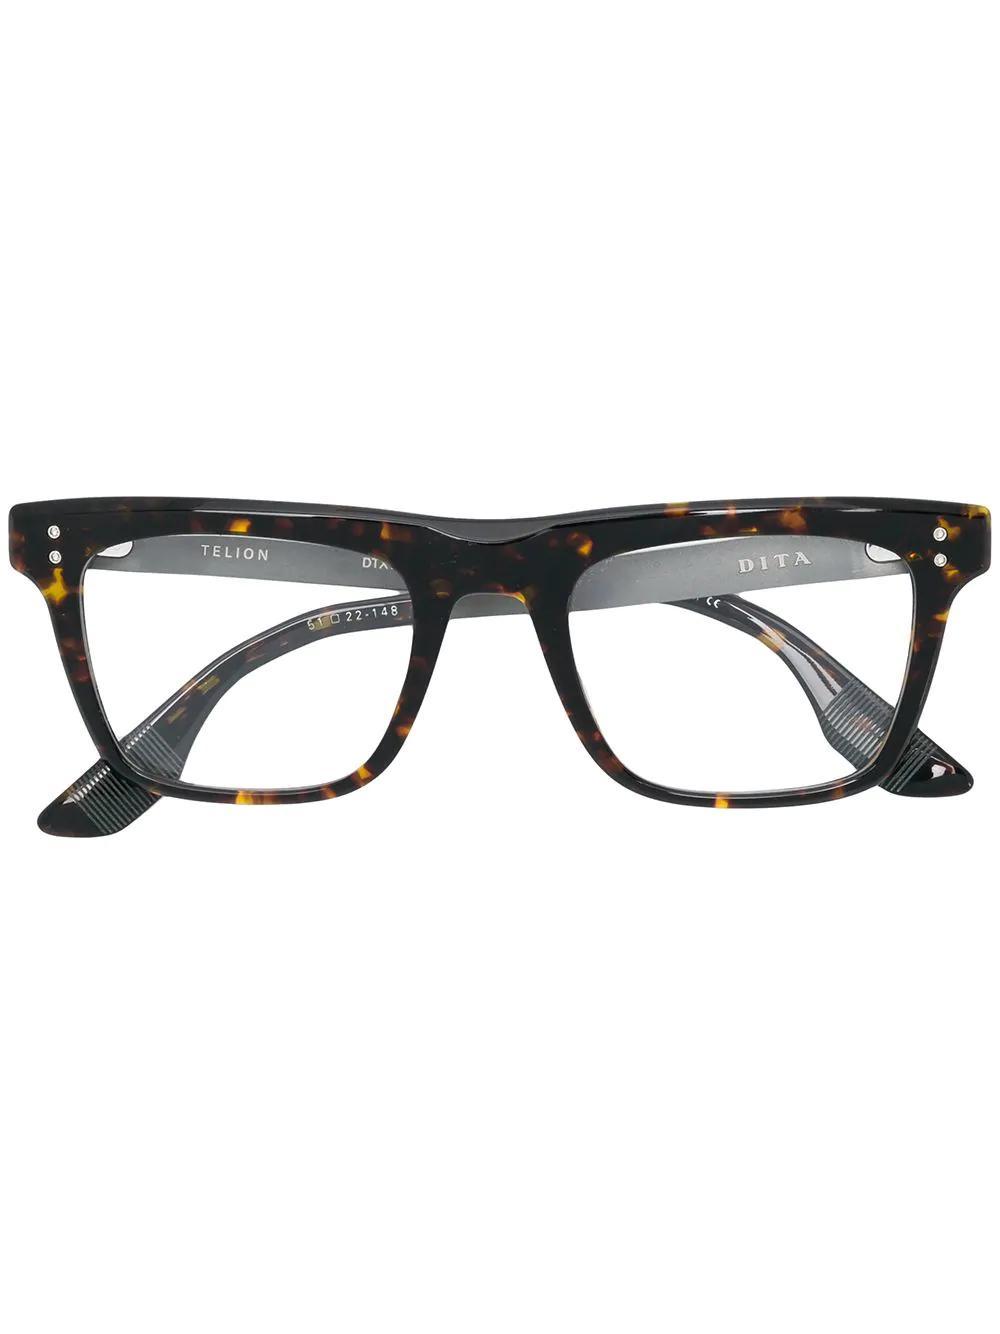 f78b4b4f767 Dita Eyewear Telion Glasses - Brown. Farfetch